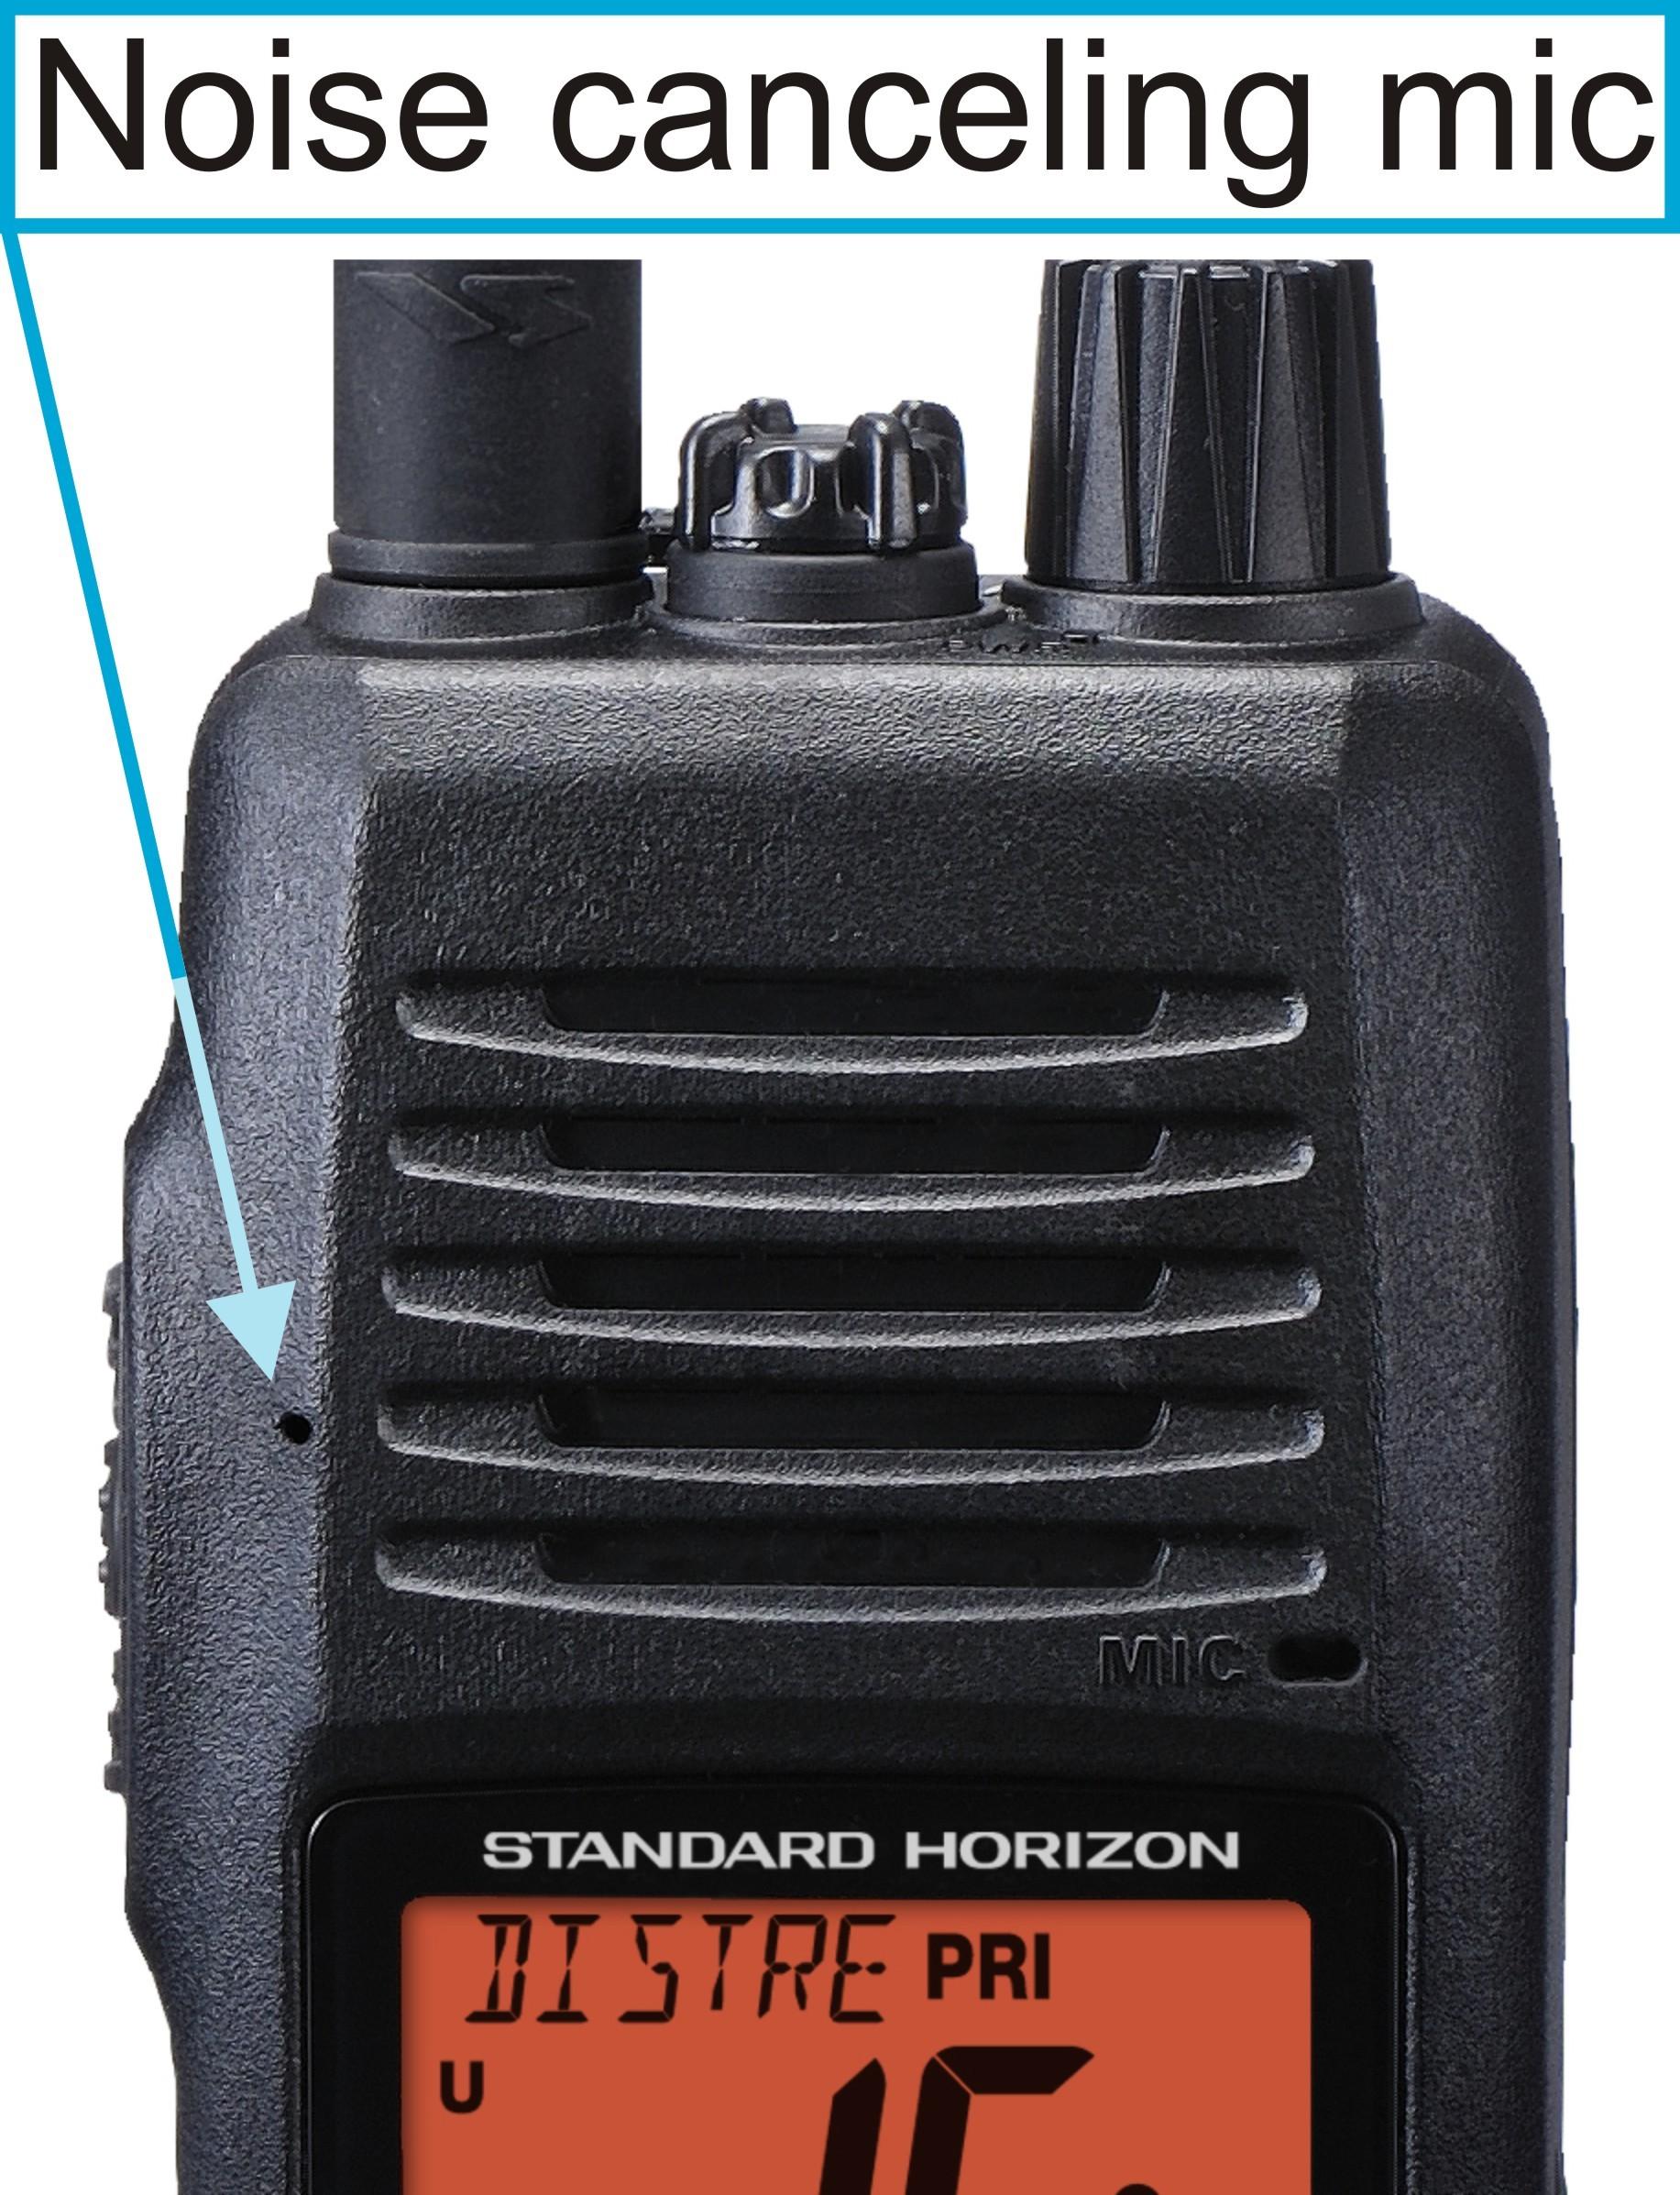 Standard Horizon HX400 Portable VHF Radio, Battery, Ant., Chrgr